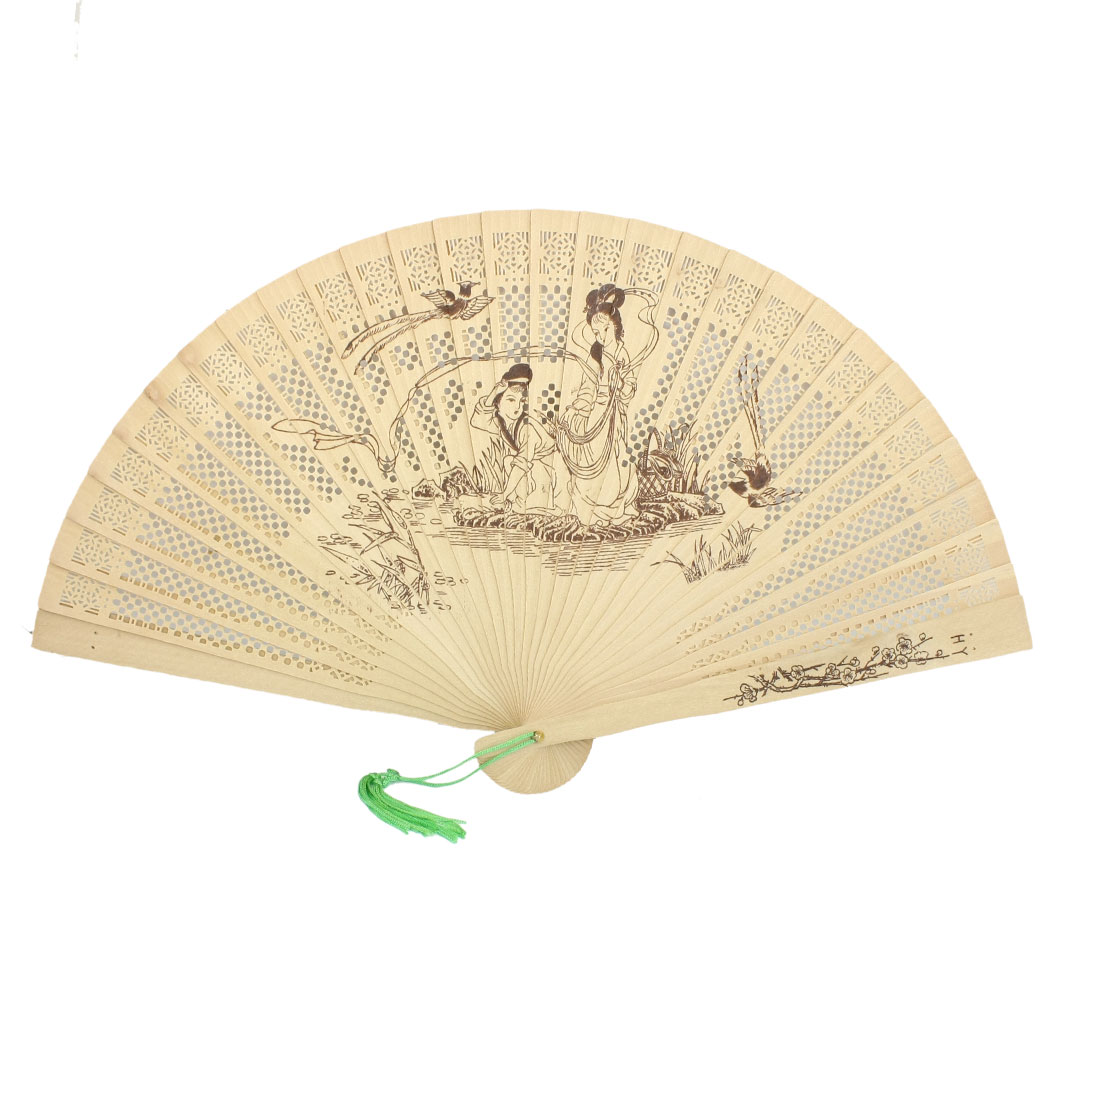 Foldable Wooden Carved Flower Lady Print Green Tassel Decor Fragrant Hand Fan